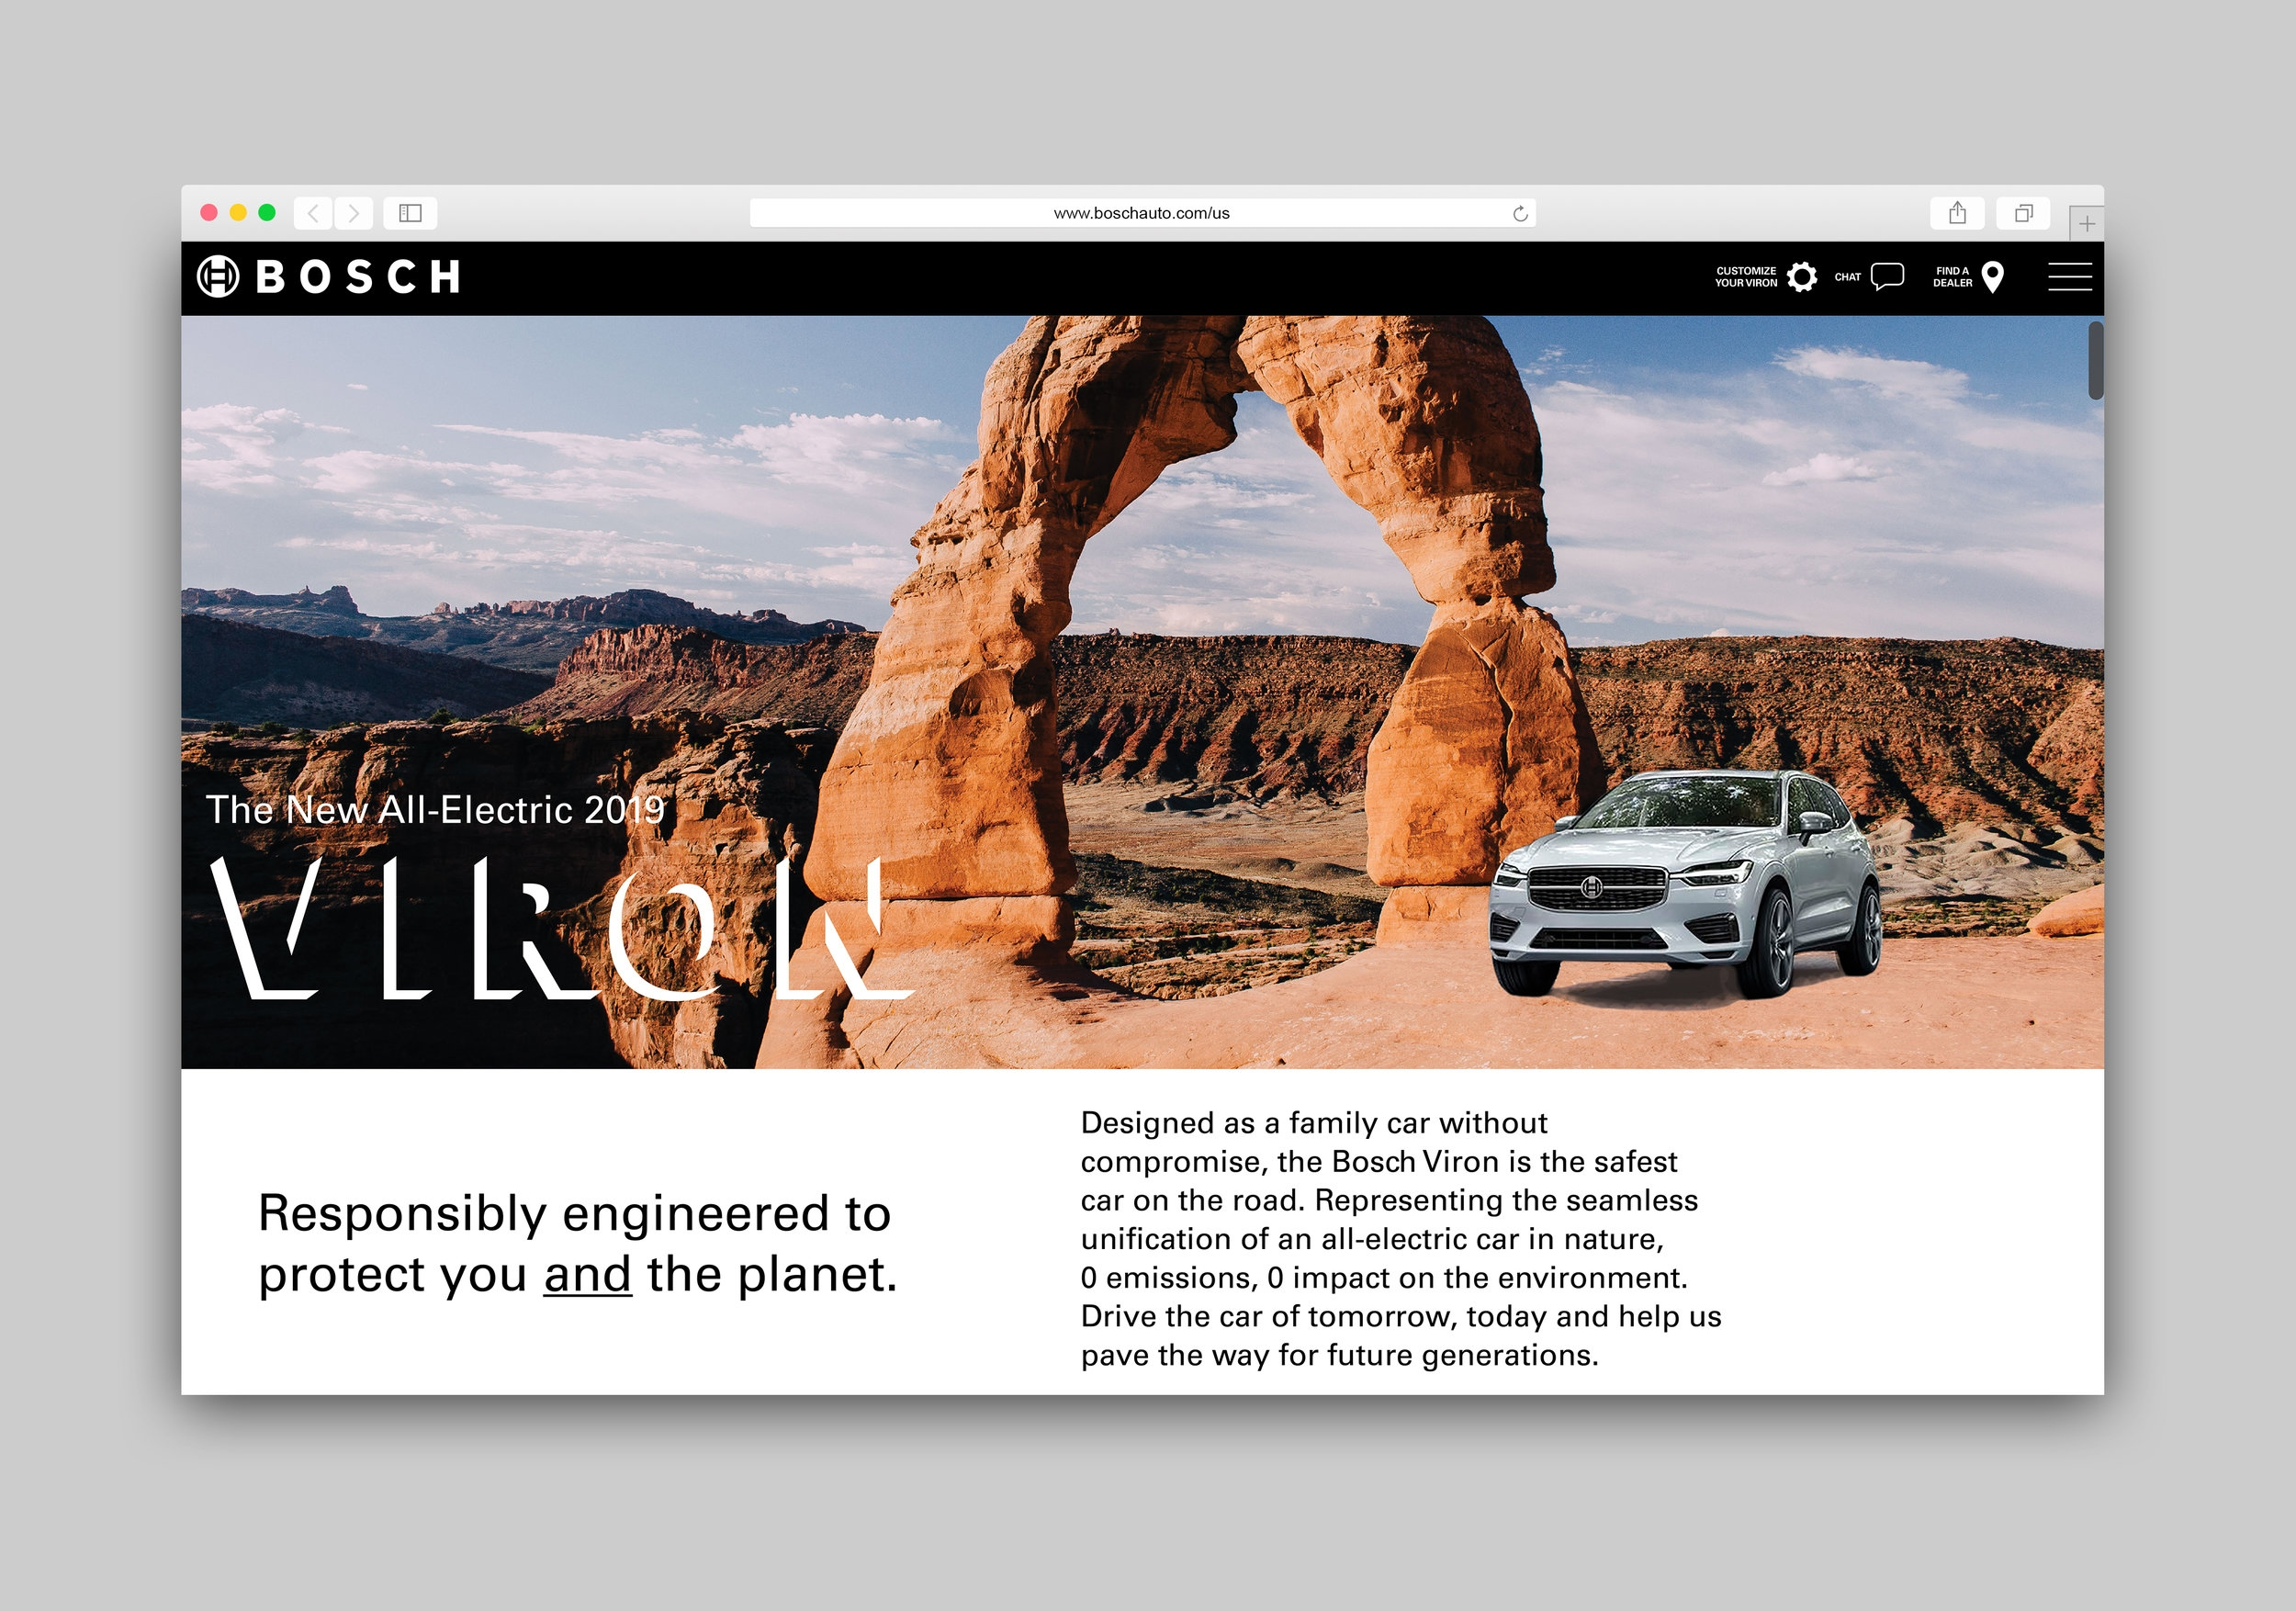 BoschAuto_WebPage1.jpg